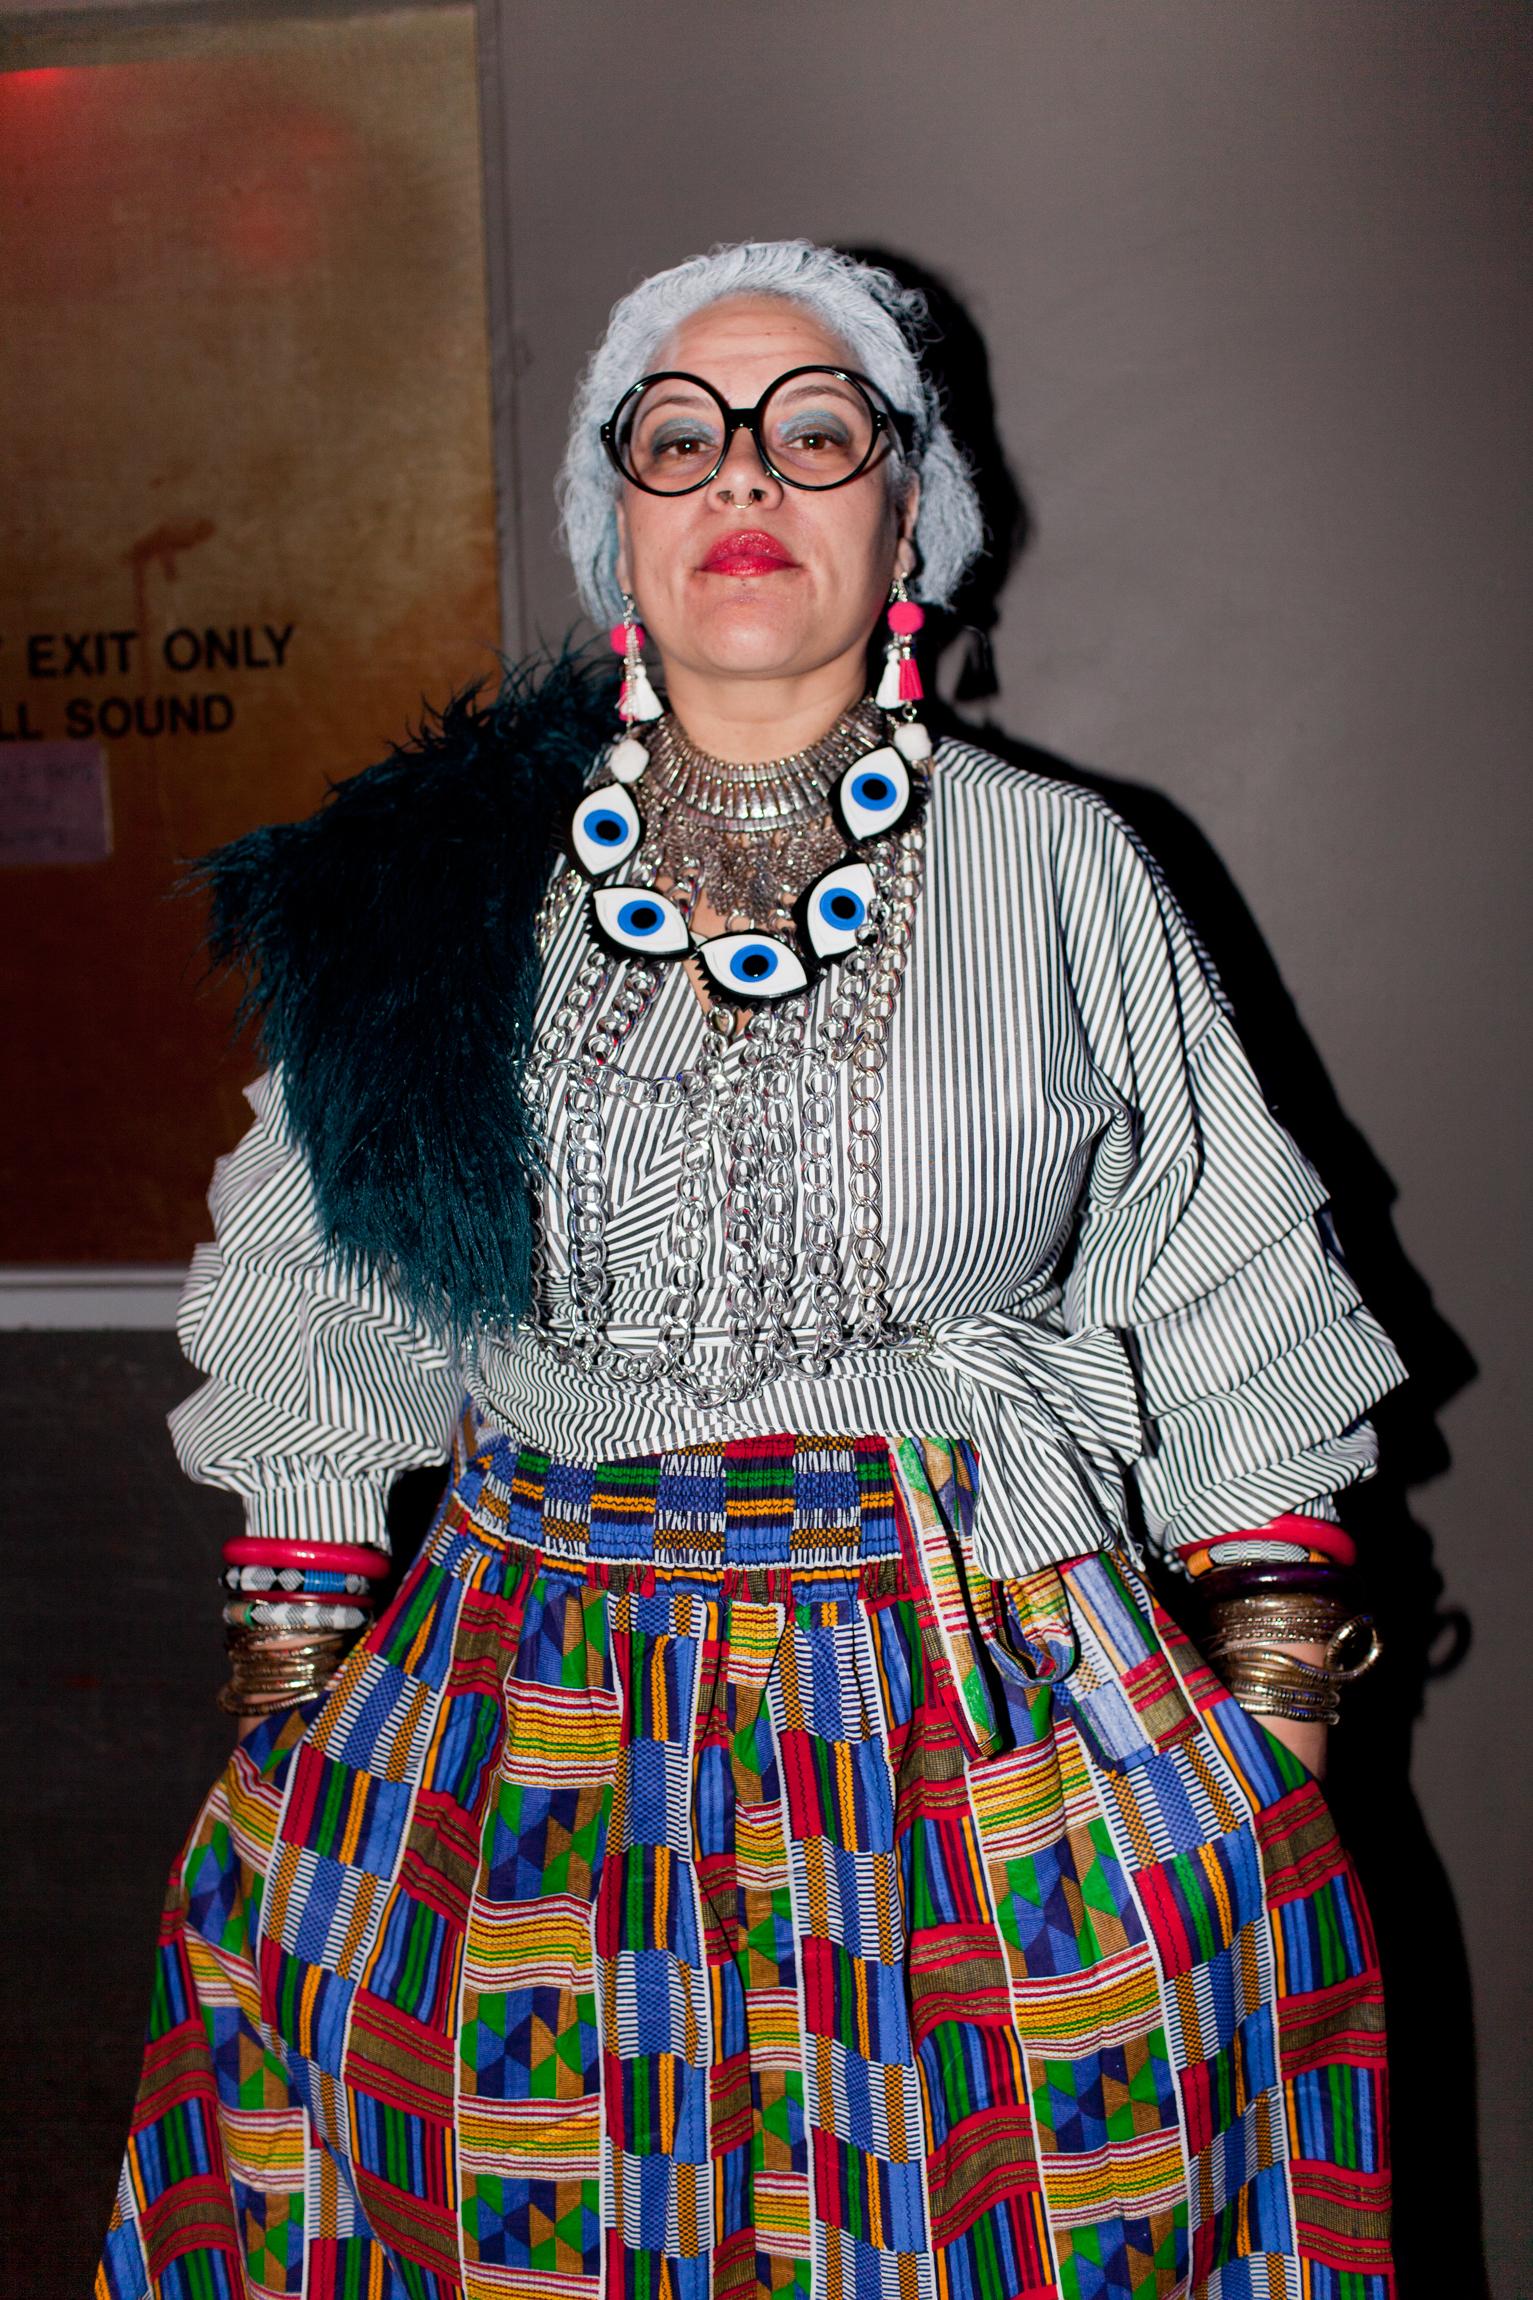 Musician Aima Paule dressed as Iris Apfel